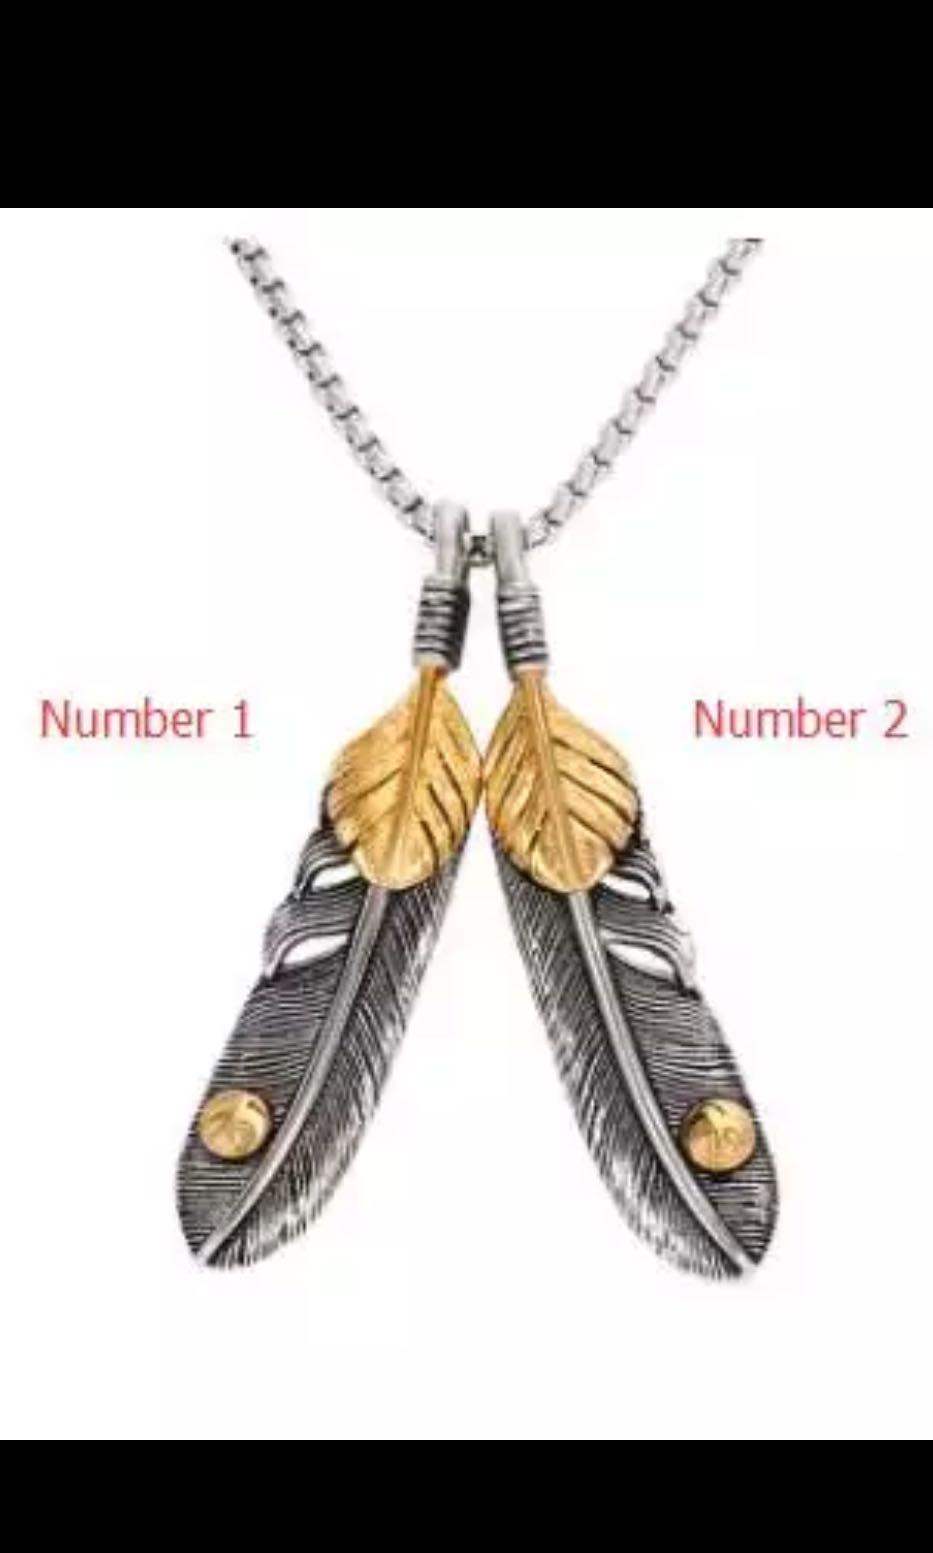 Japan Takahashi Goro Goro S Titanium Jewelry Mens Necklaces 316l